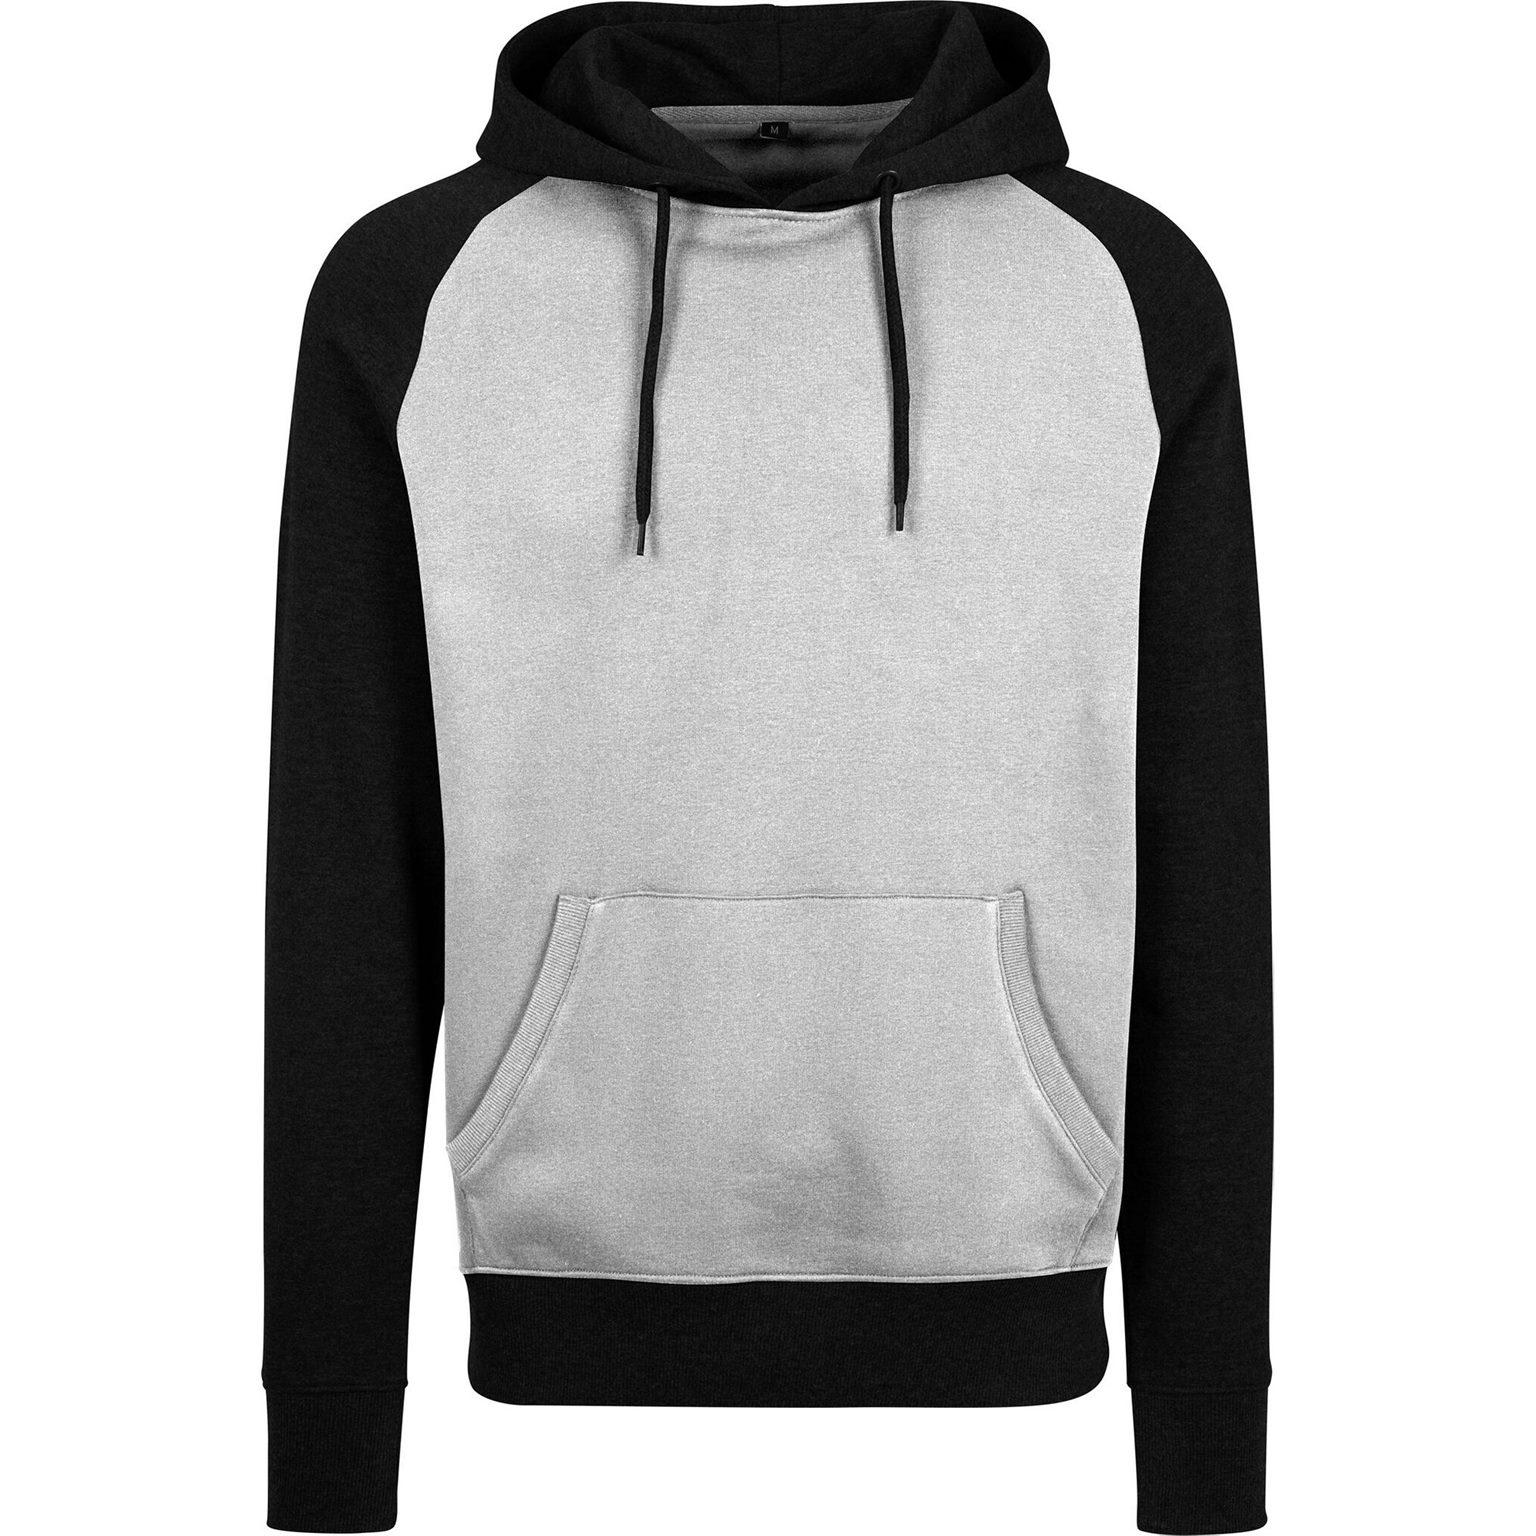 Sayah Mens Slim Oversize Plaid Print Hooded Pullover Top Sweatshirt